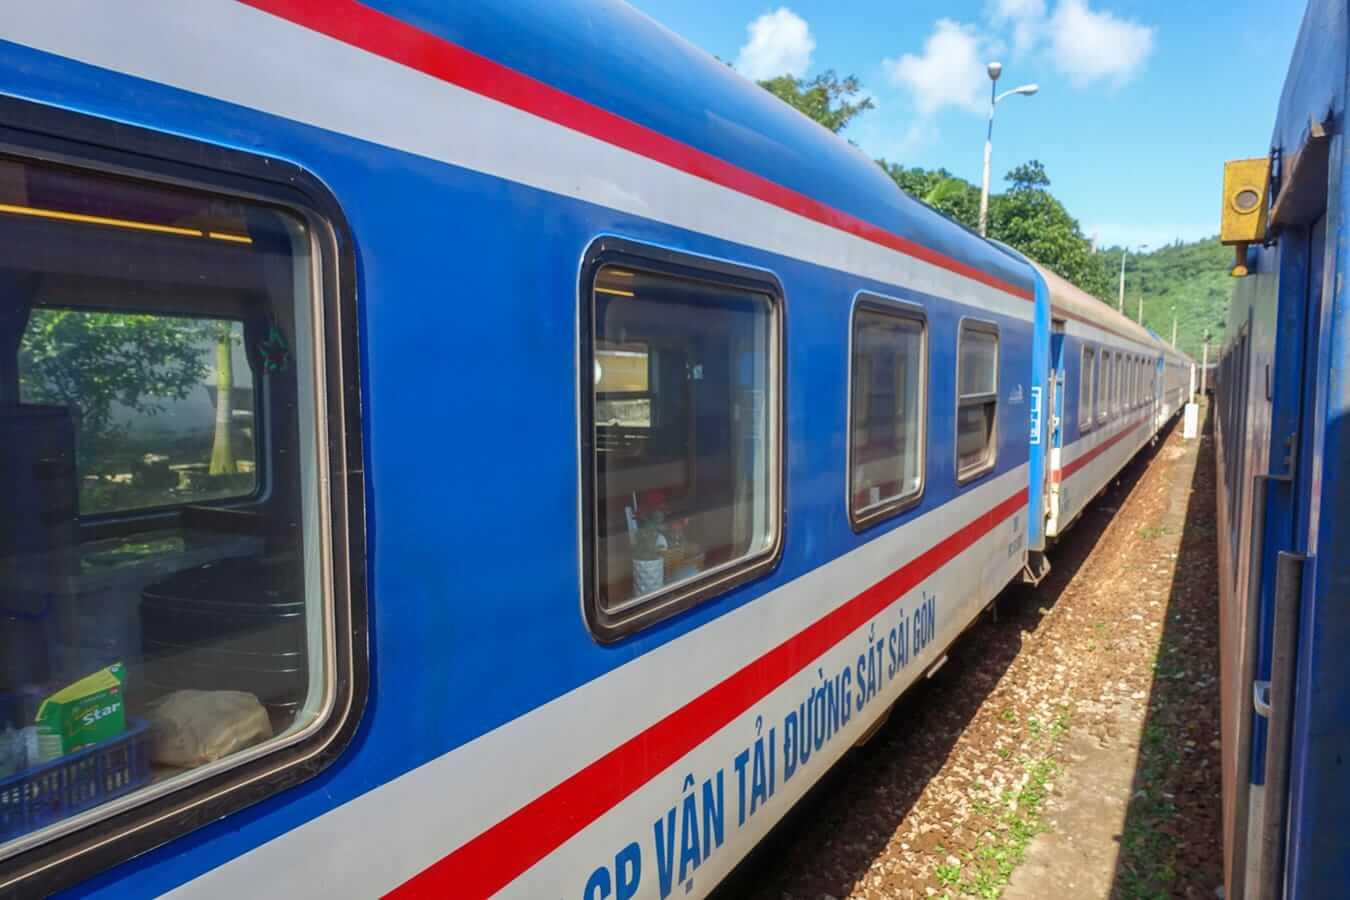 Vietnamese train